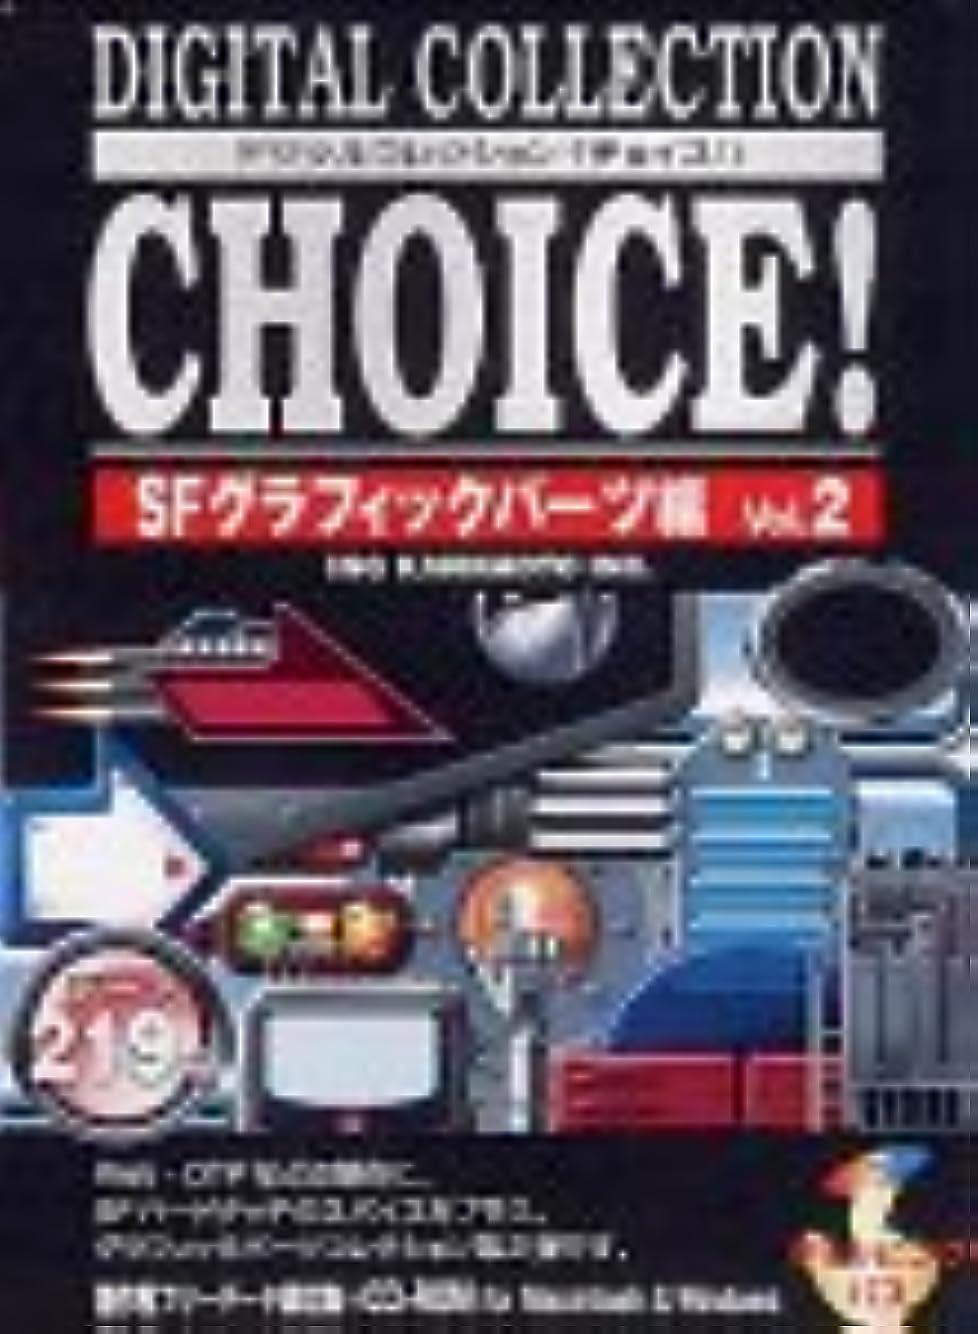 Digital Collection Choice! No.15 SFグラフィックパーツ編 Vol.2